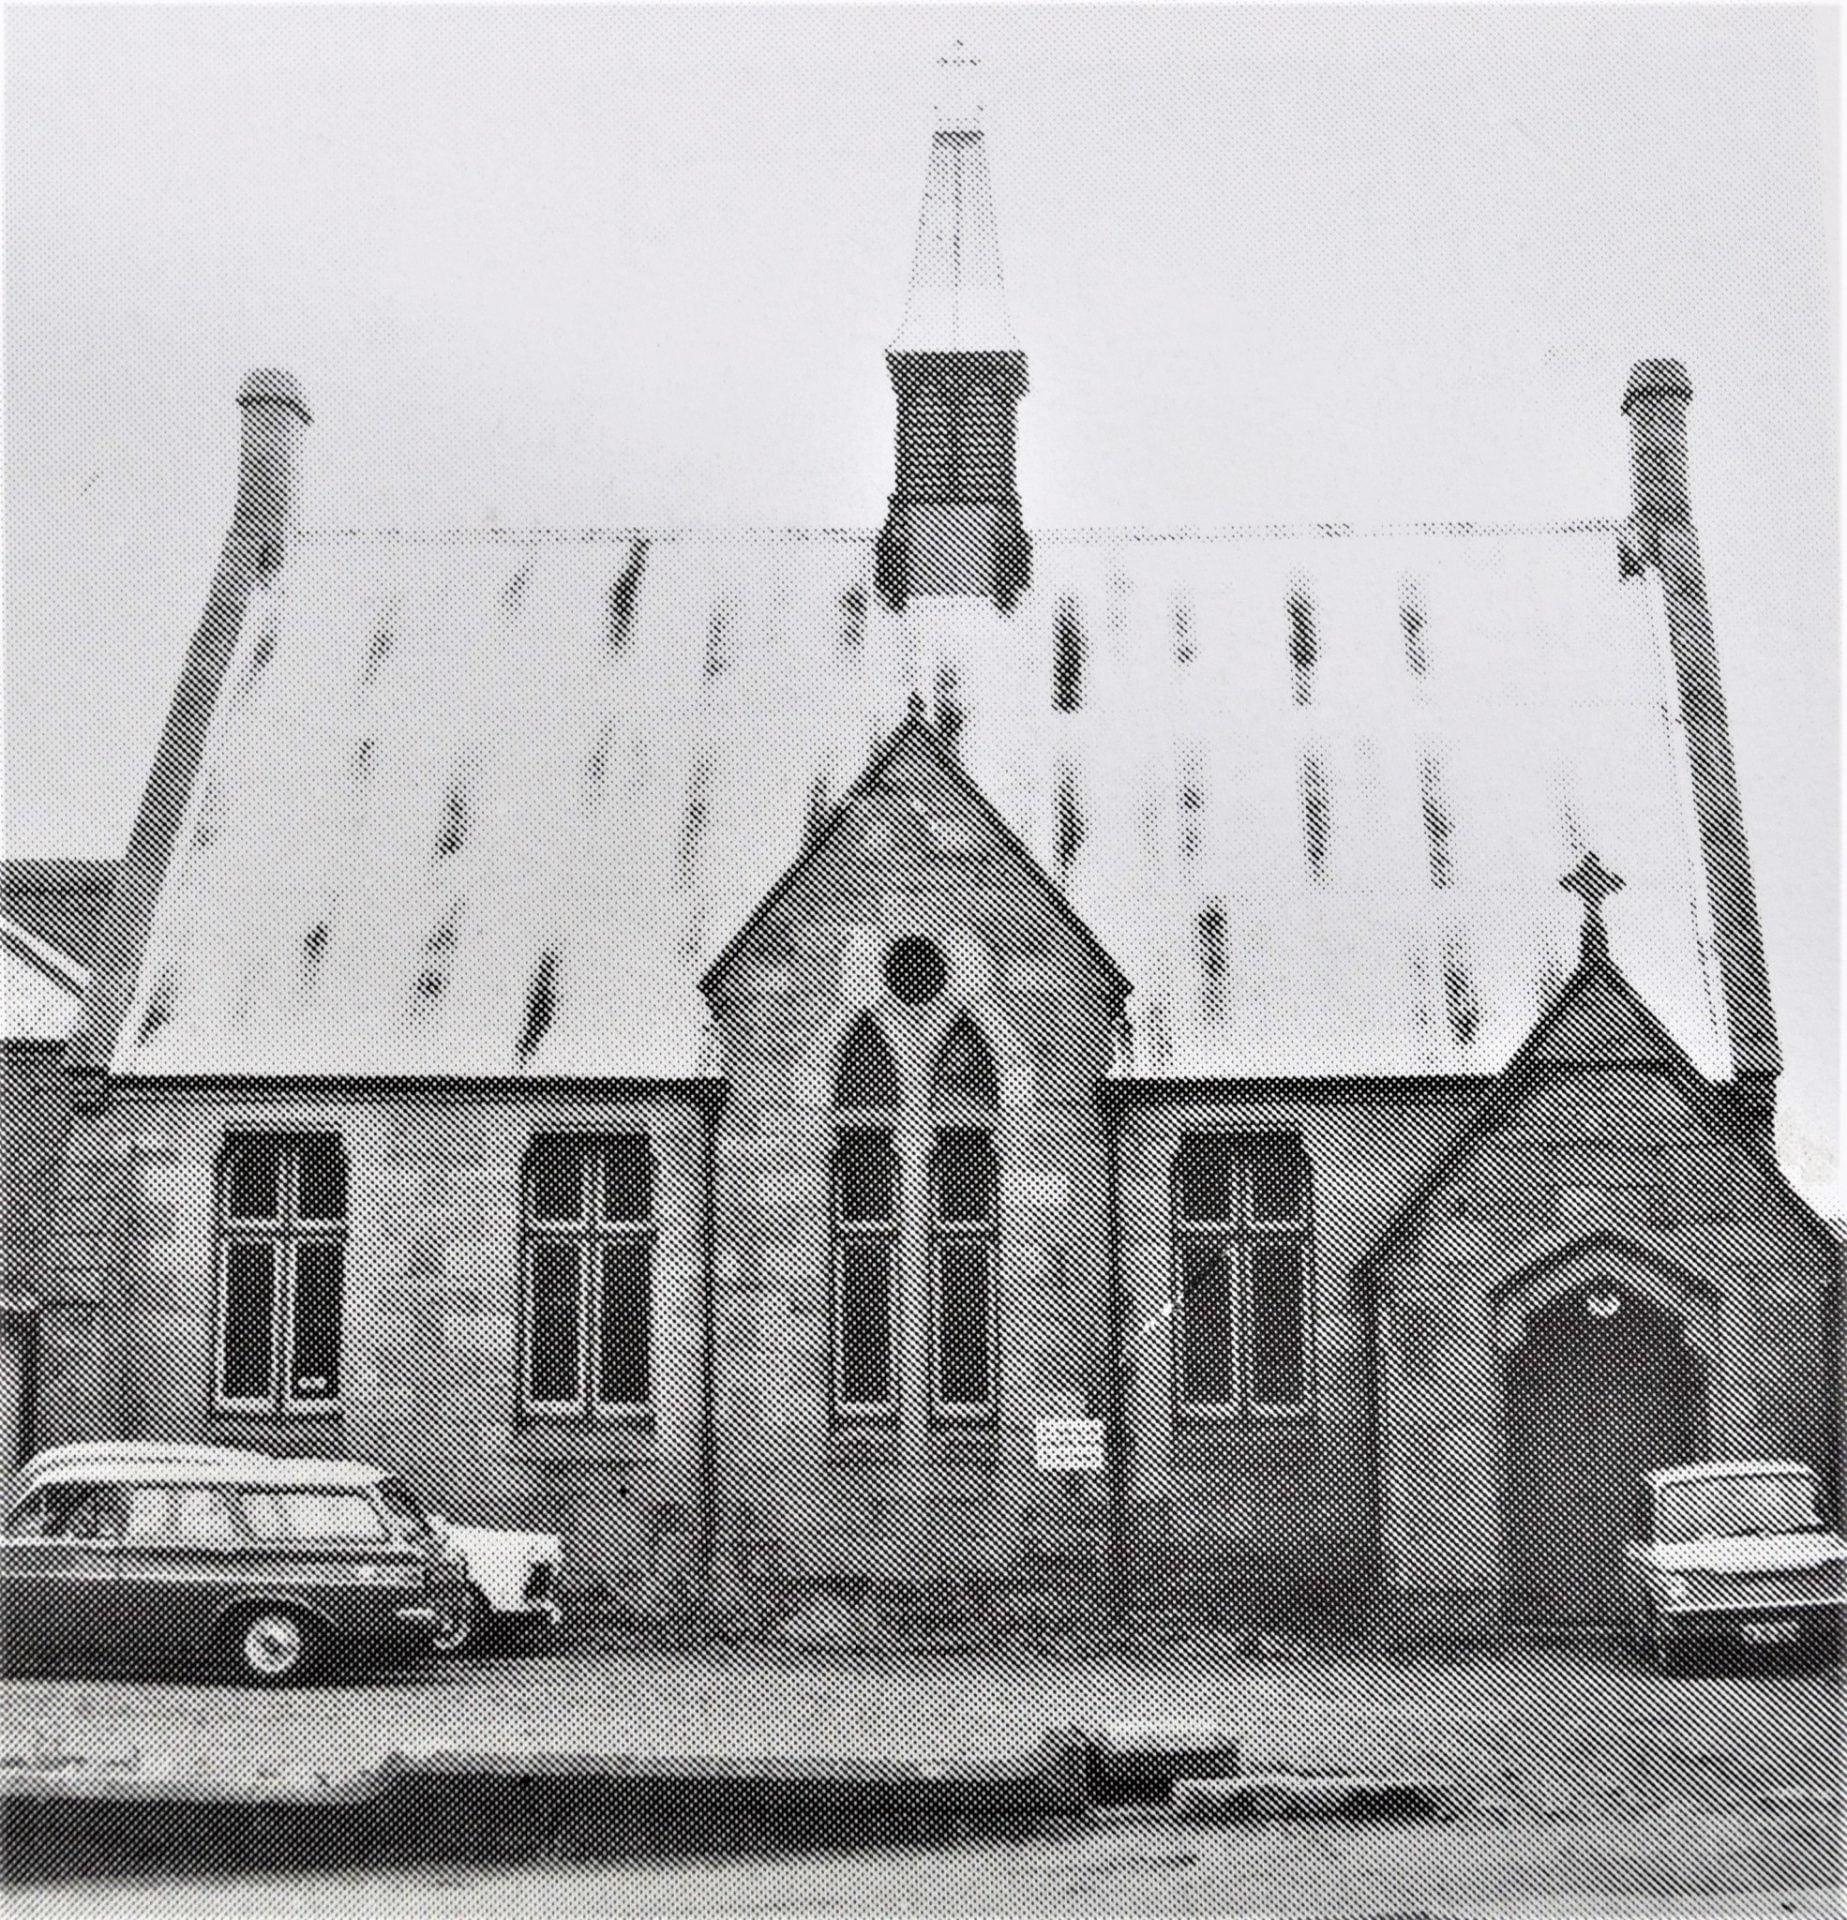 Historical Photo of St David's School